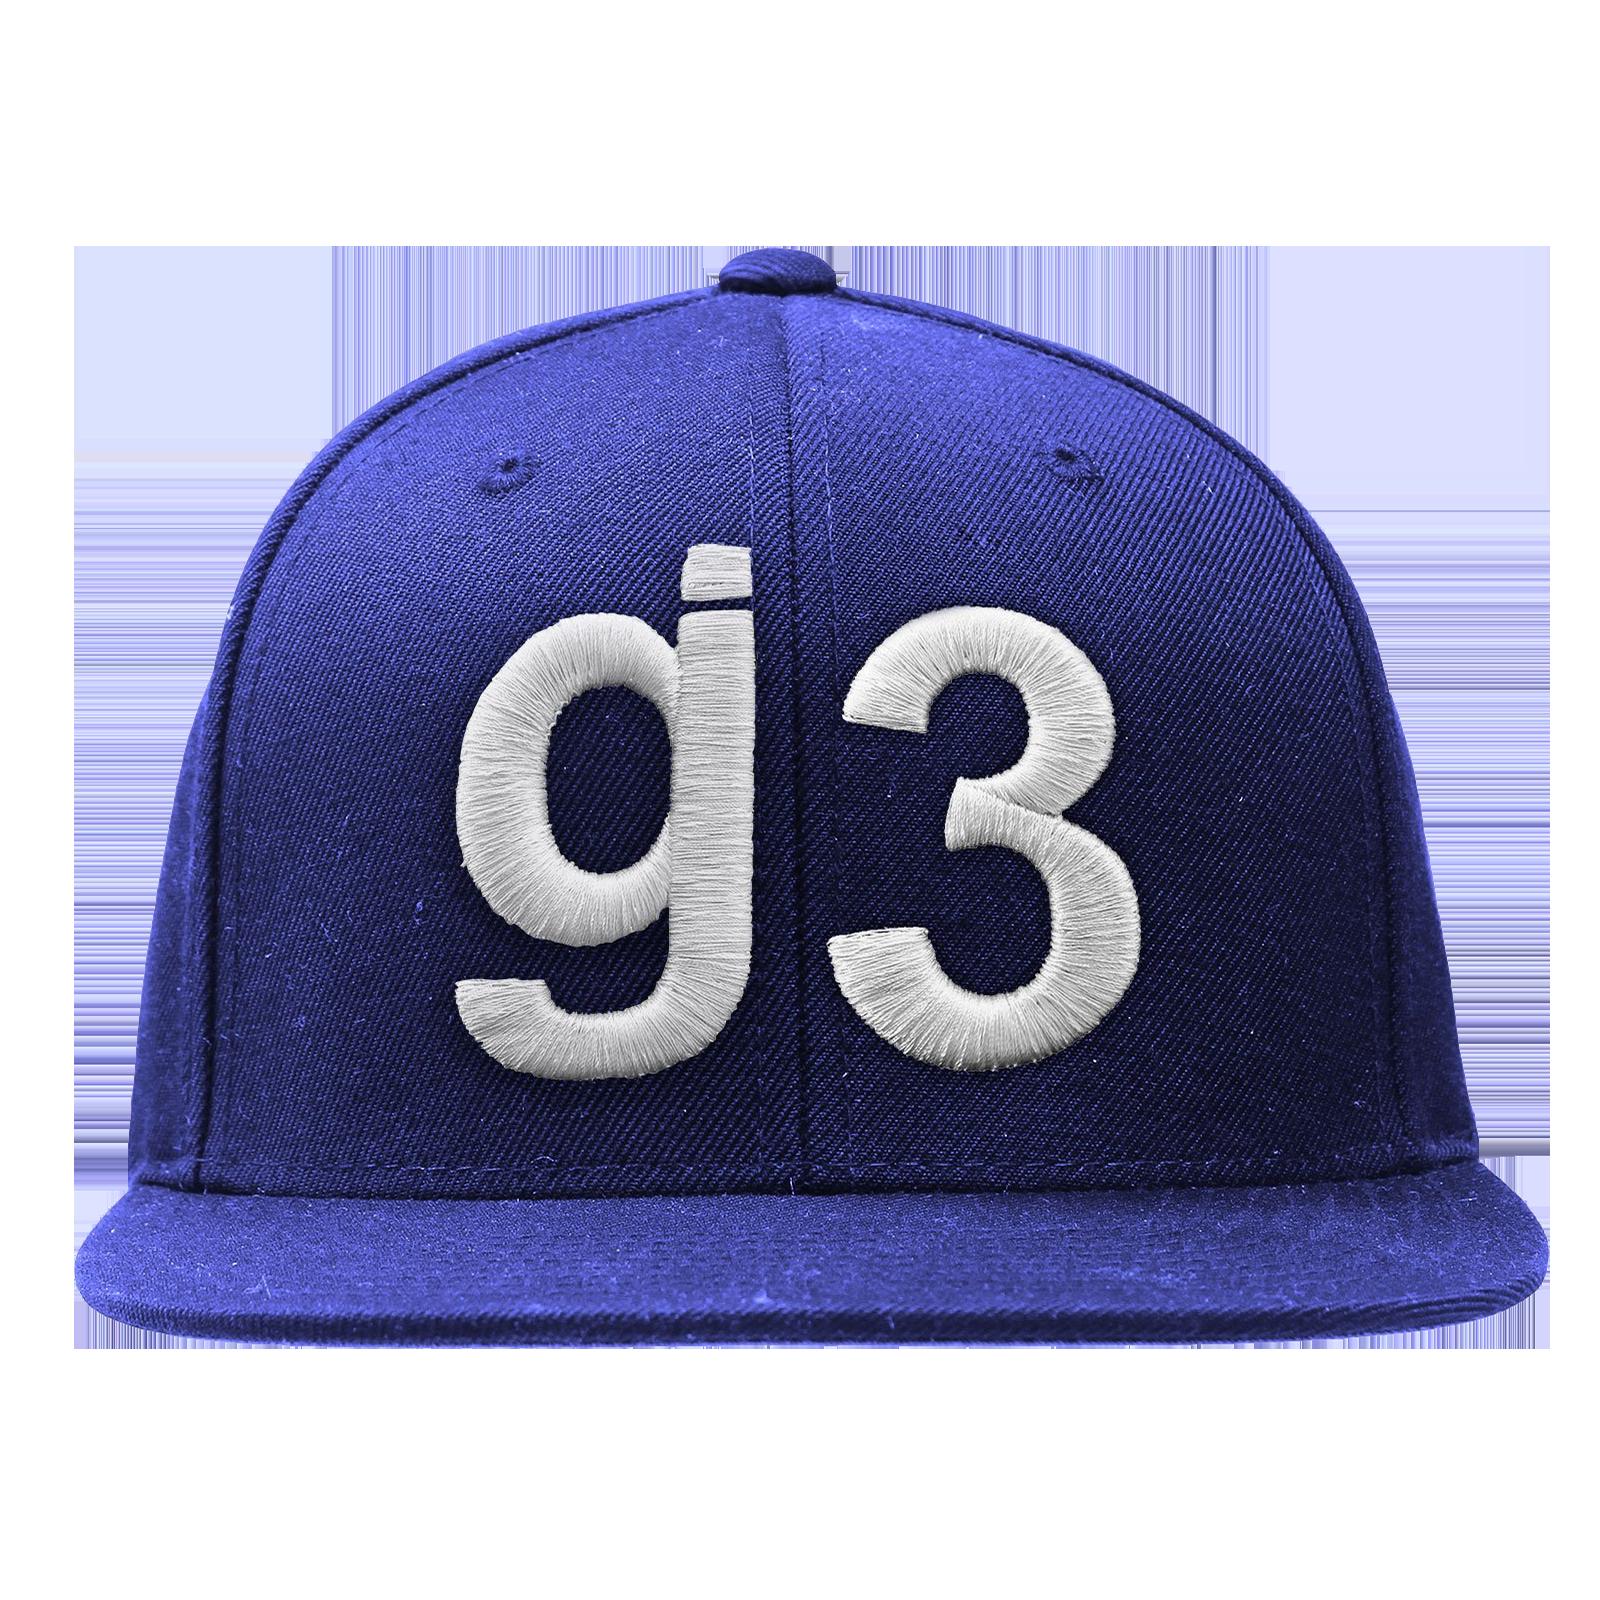 EYEWTKAS G3 White on Blue Snapback